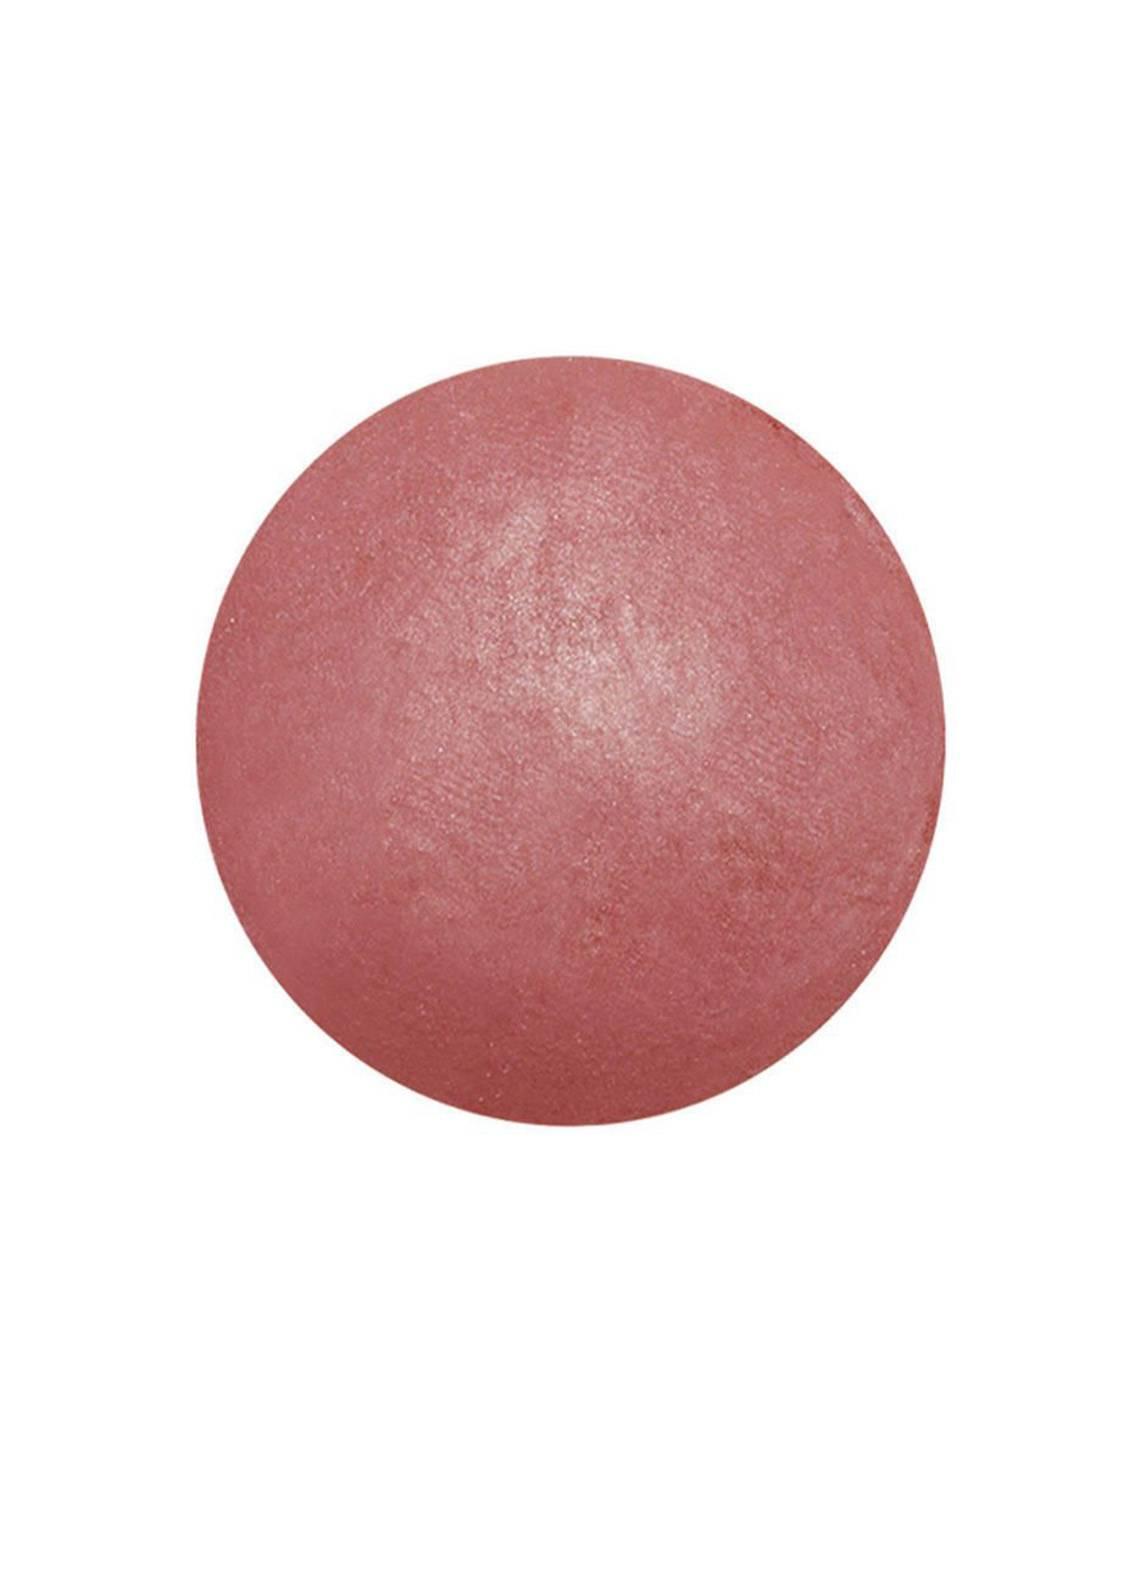 DMGM Luminous Touch Cheek Blusher - Soft Cinnamon - 08